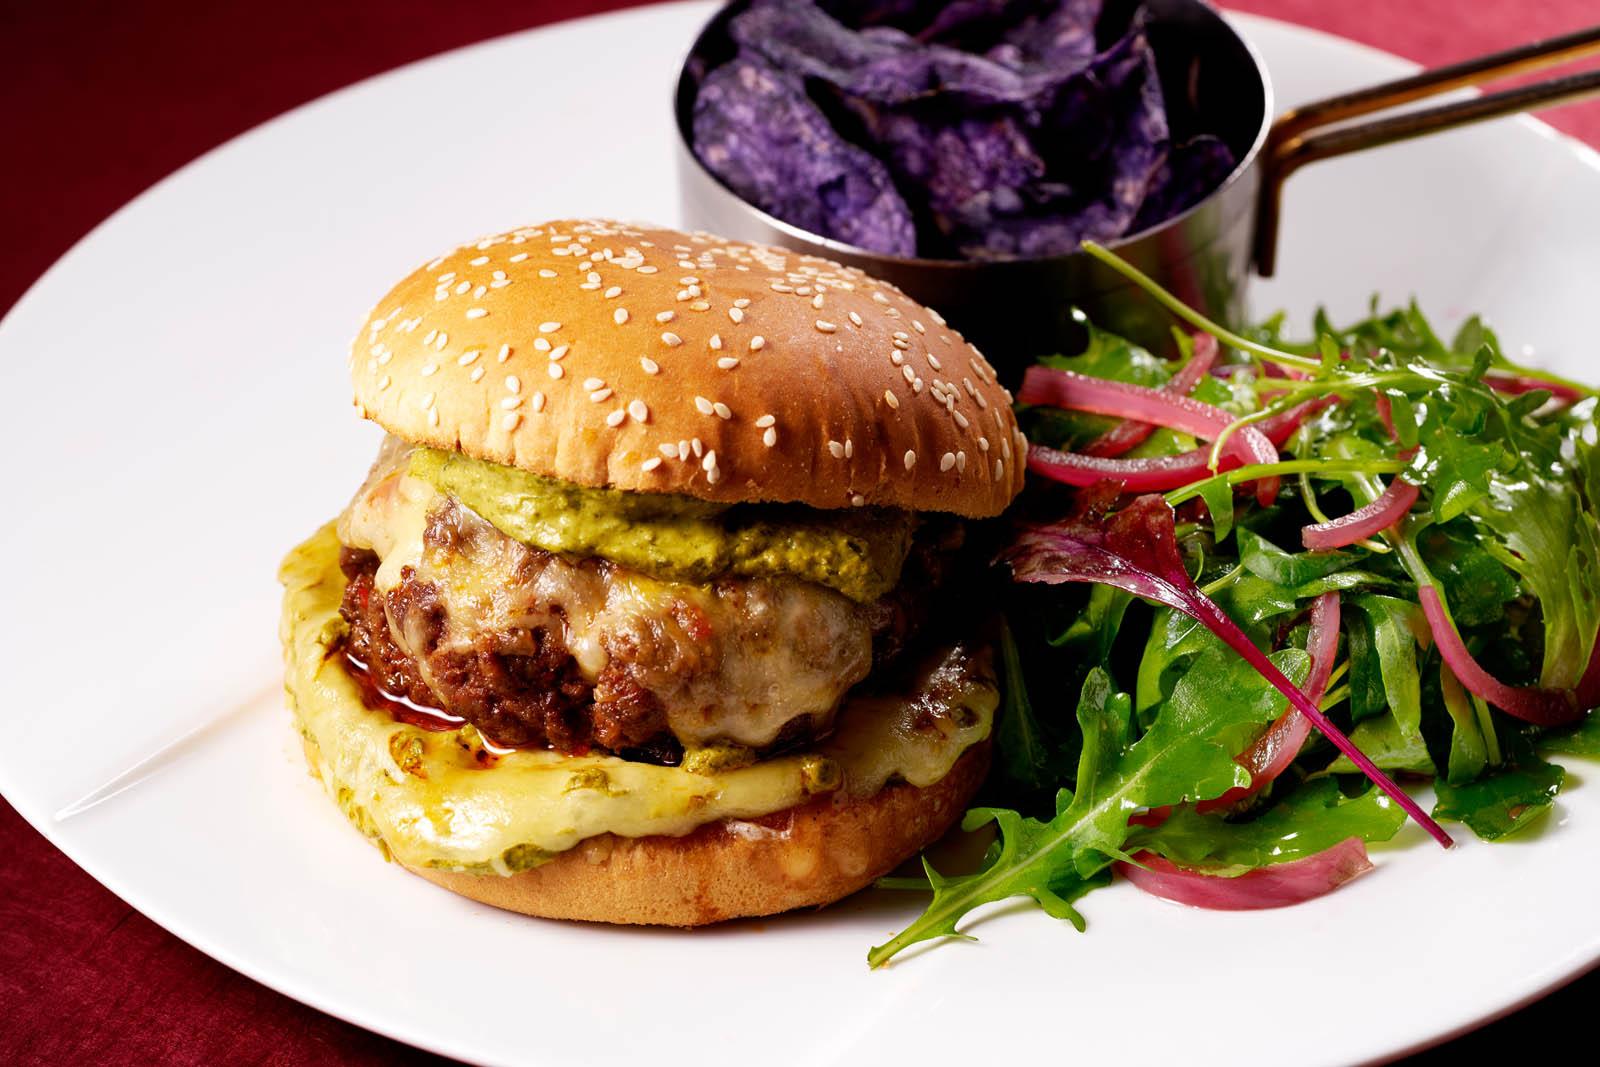 Burger sauce moutarde, chips vitelotes et salade